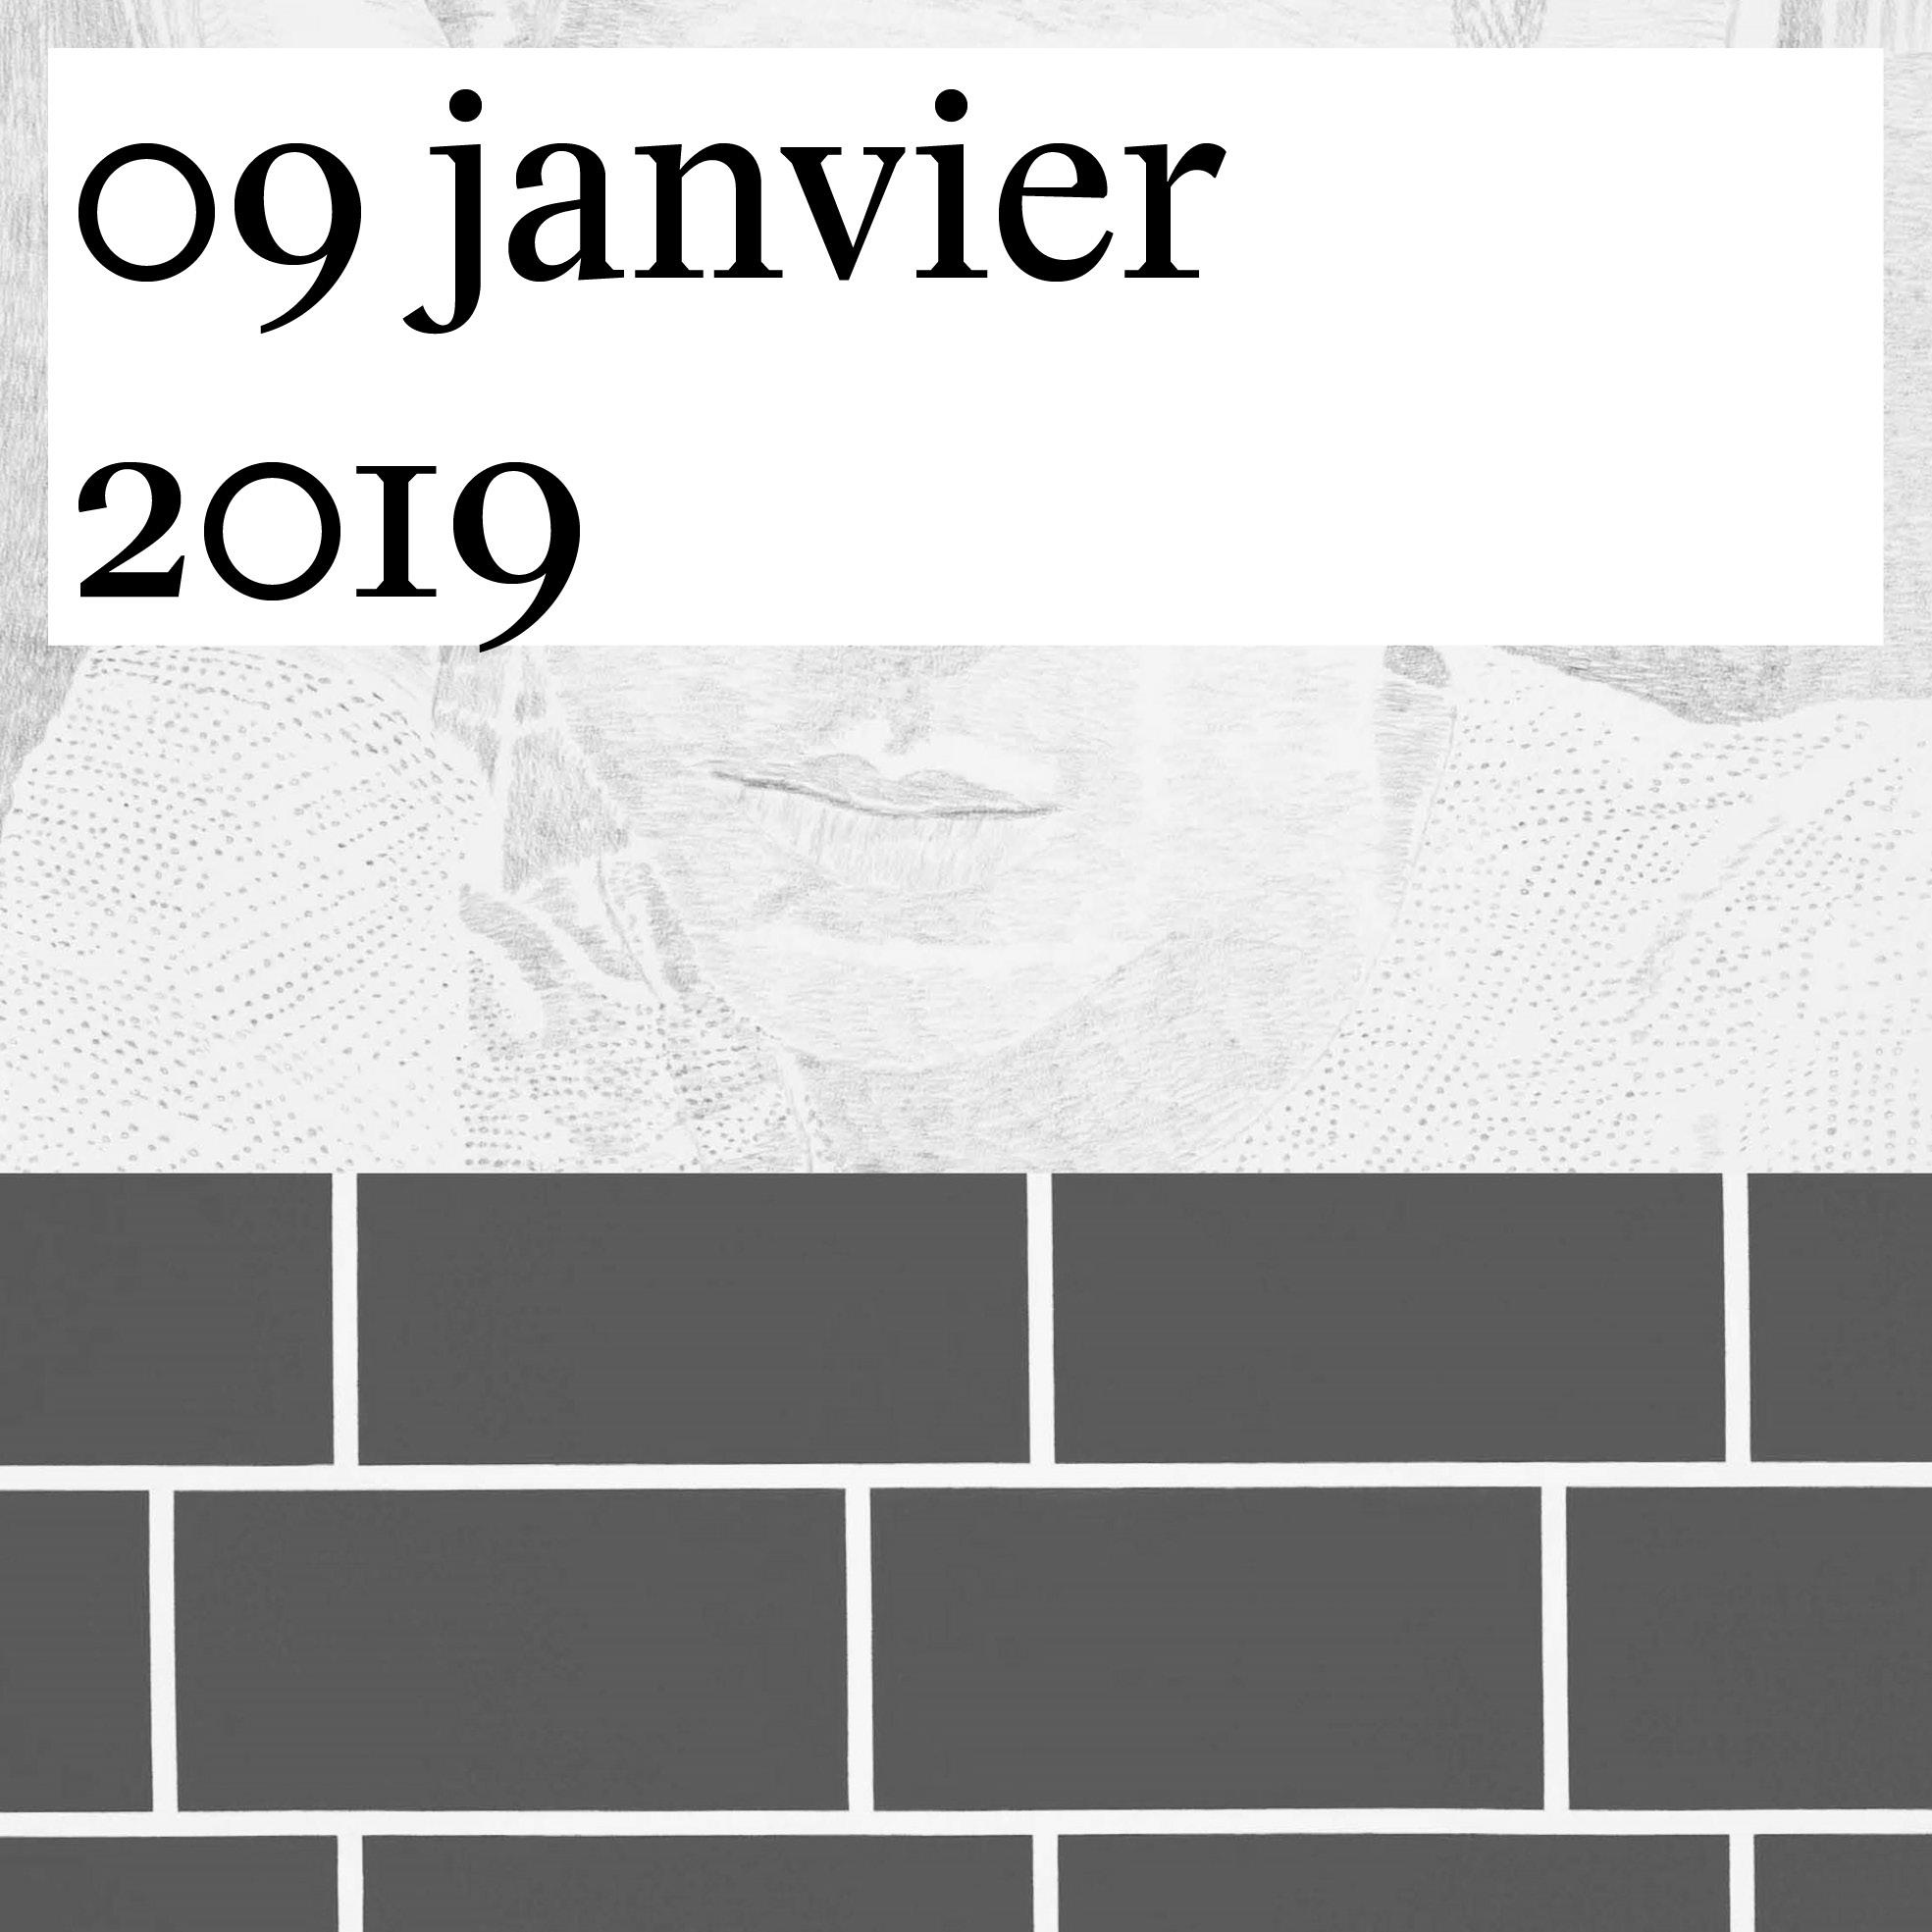 Vernissage de «Adagio e appassionato. Conversation avec Jean Crotti et Jean-Luc Manz» de Françoise Jaunin